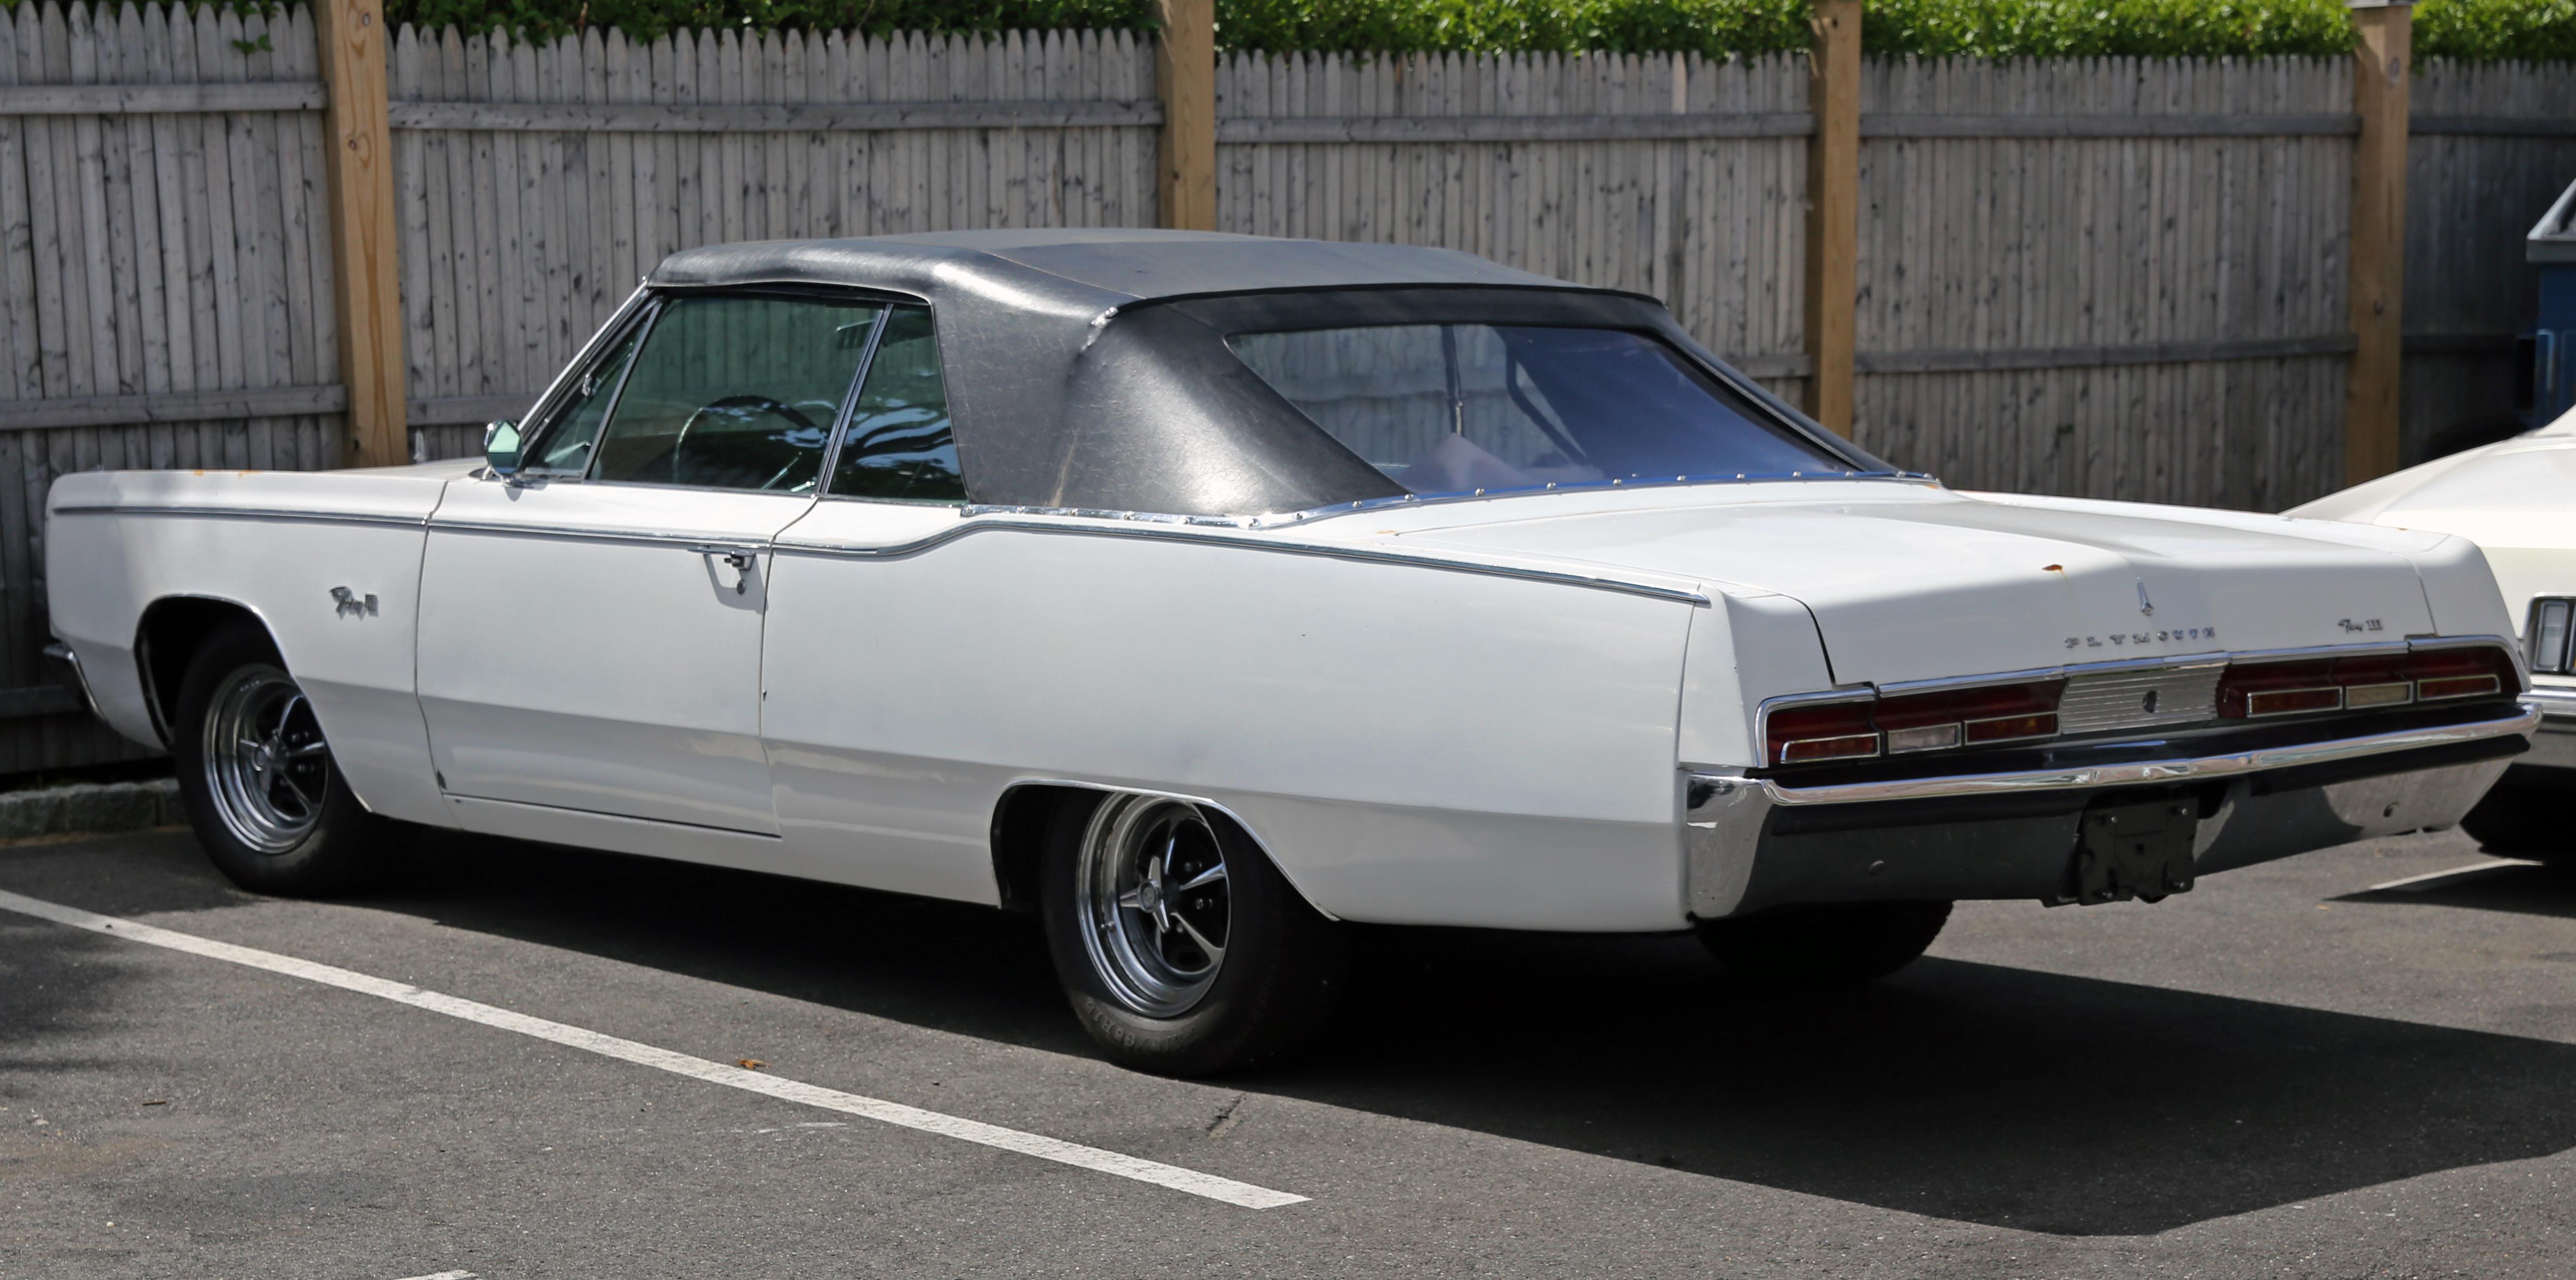 Datei 1967 Plymouth Fury Iii Convertible  White   Rear